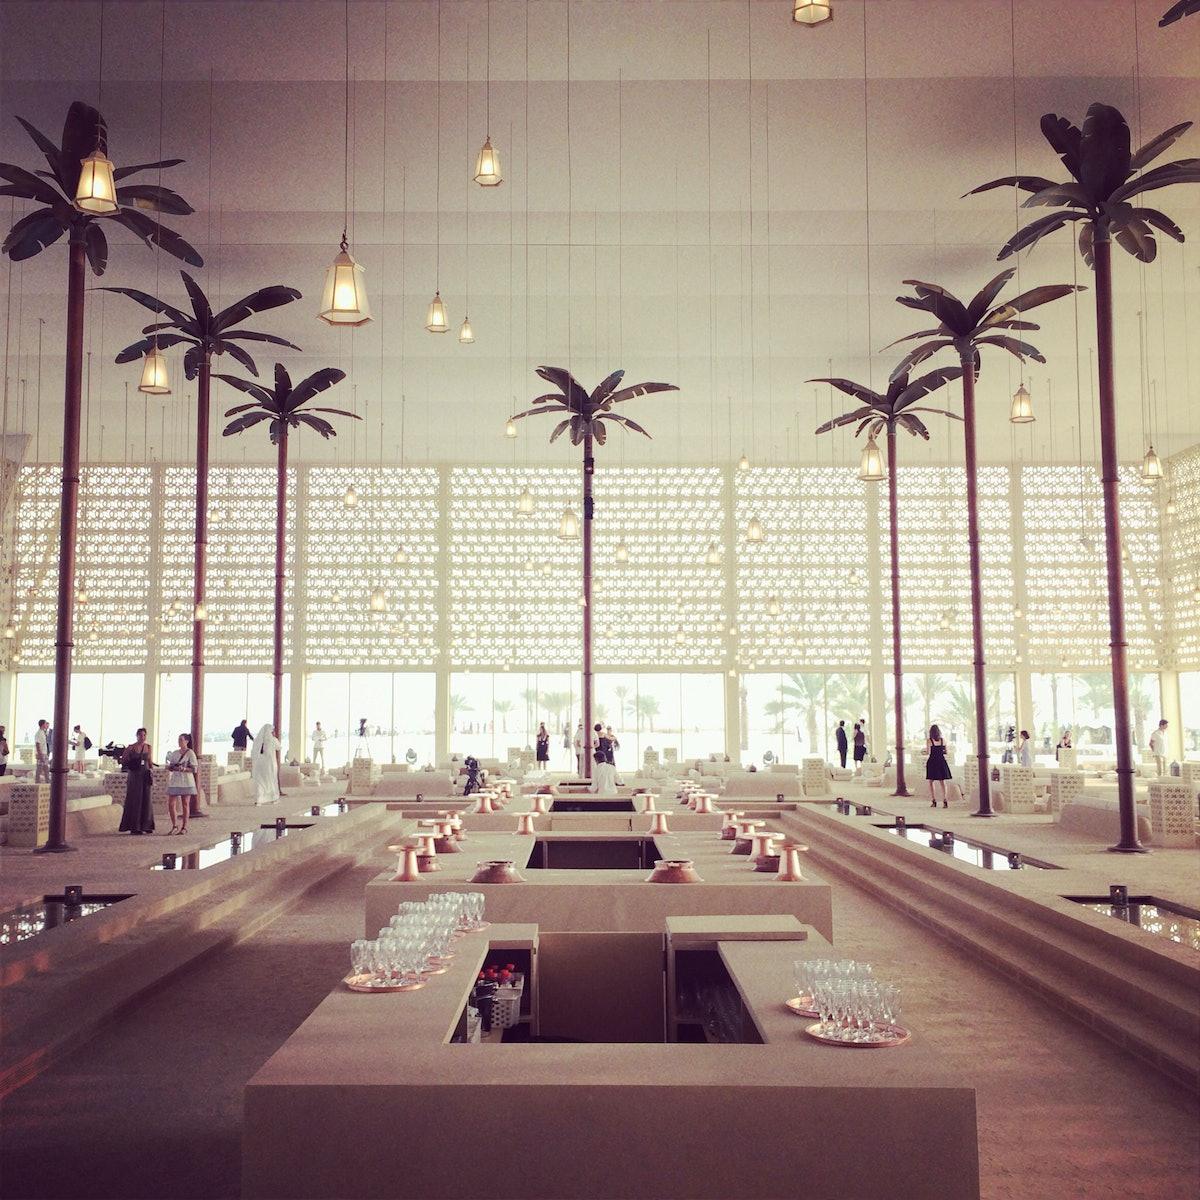 Chanel Cruise 2015 Dubai